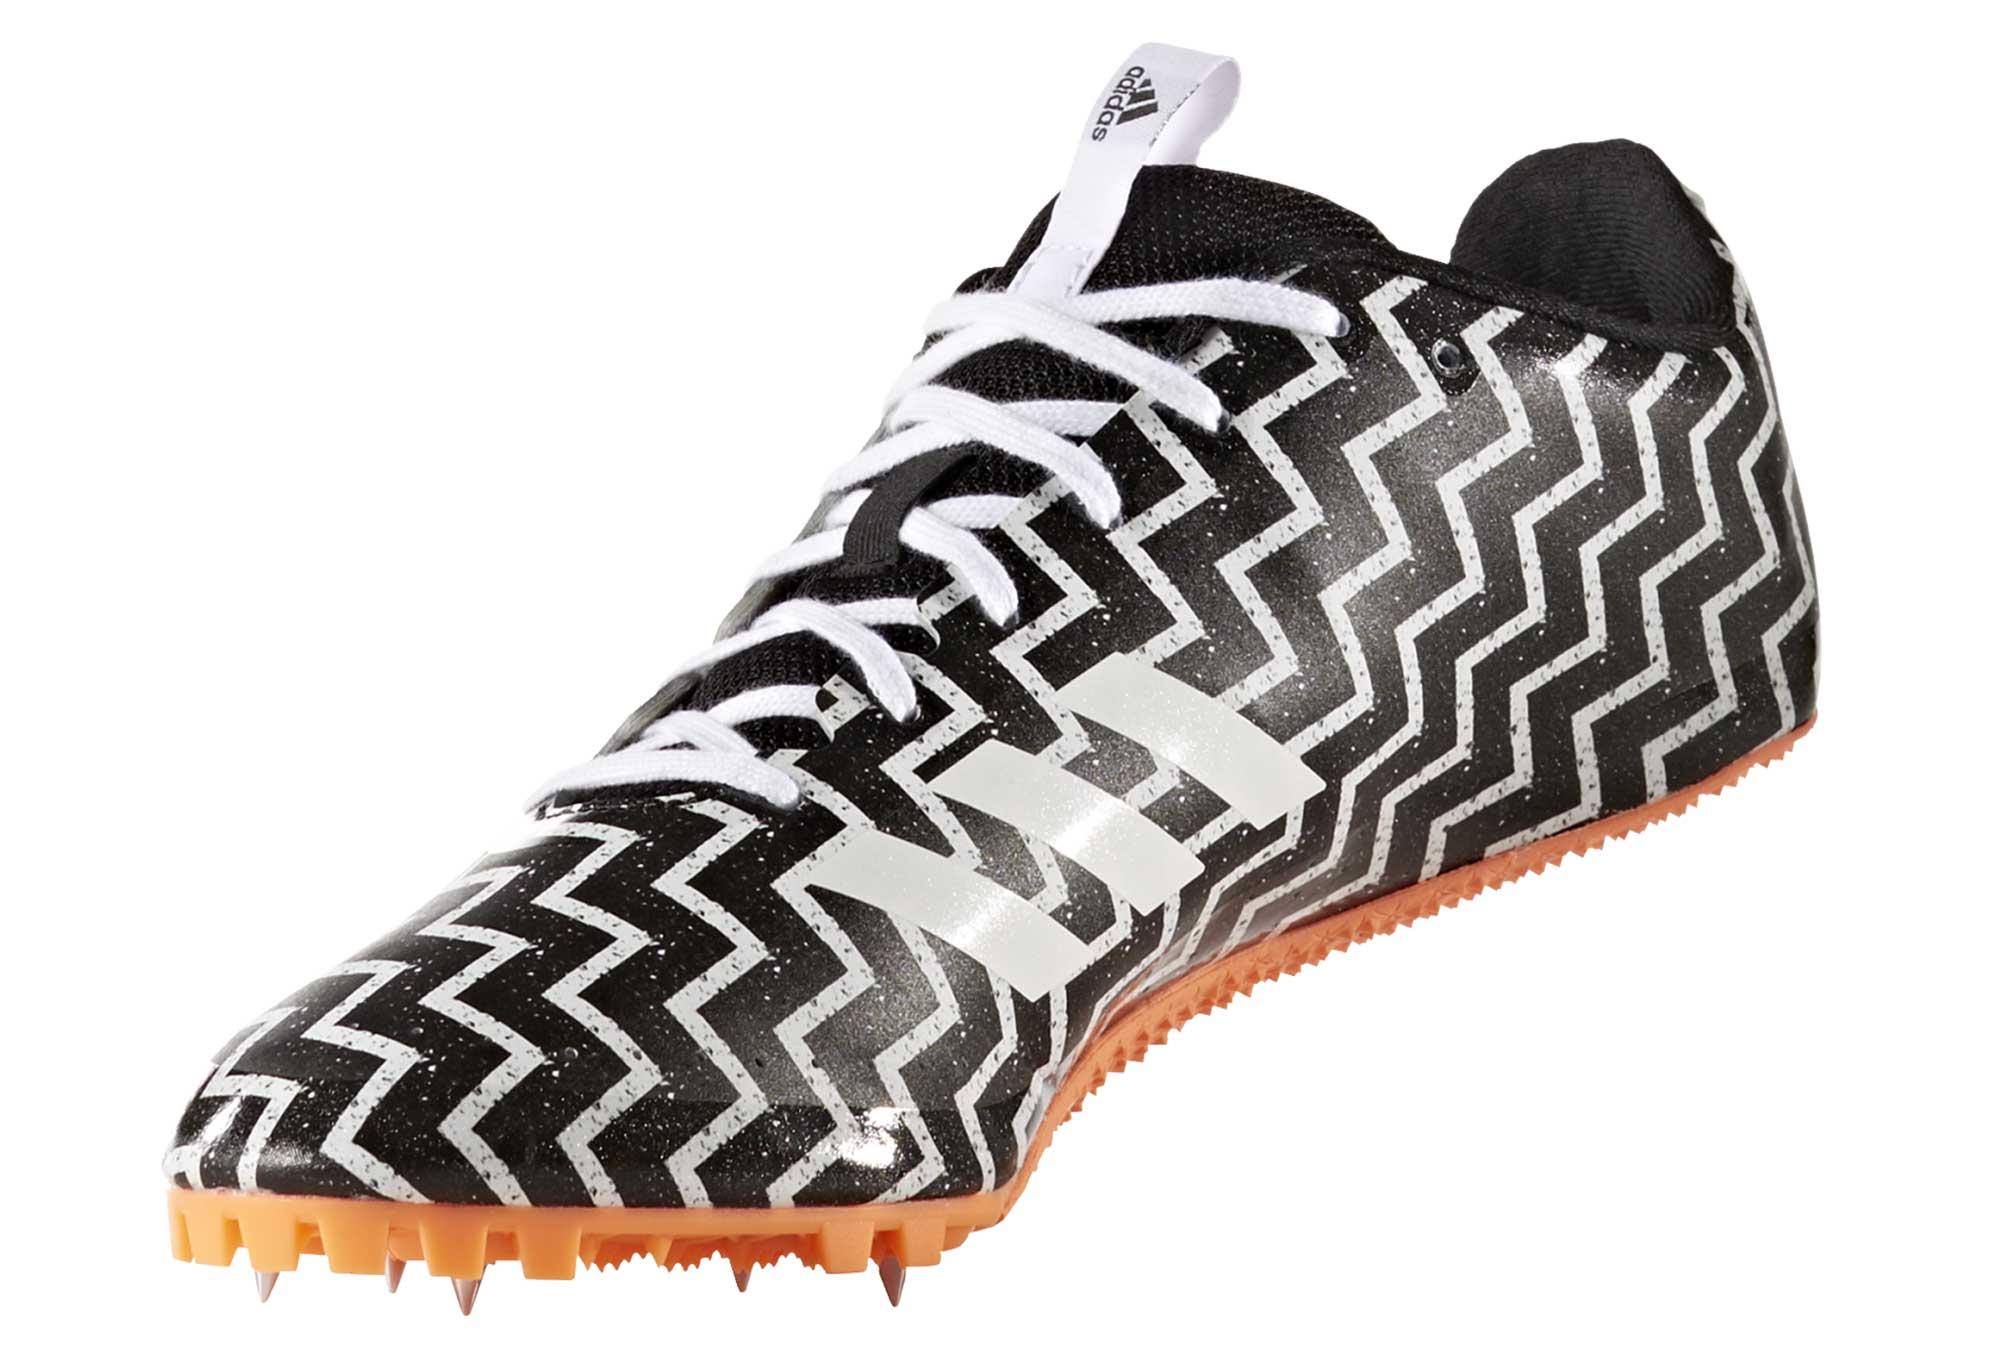 low priced c19c1 e9be3 Chaussures dAthlétisme adidas running Sprintstar Noir